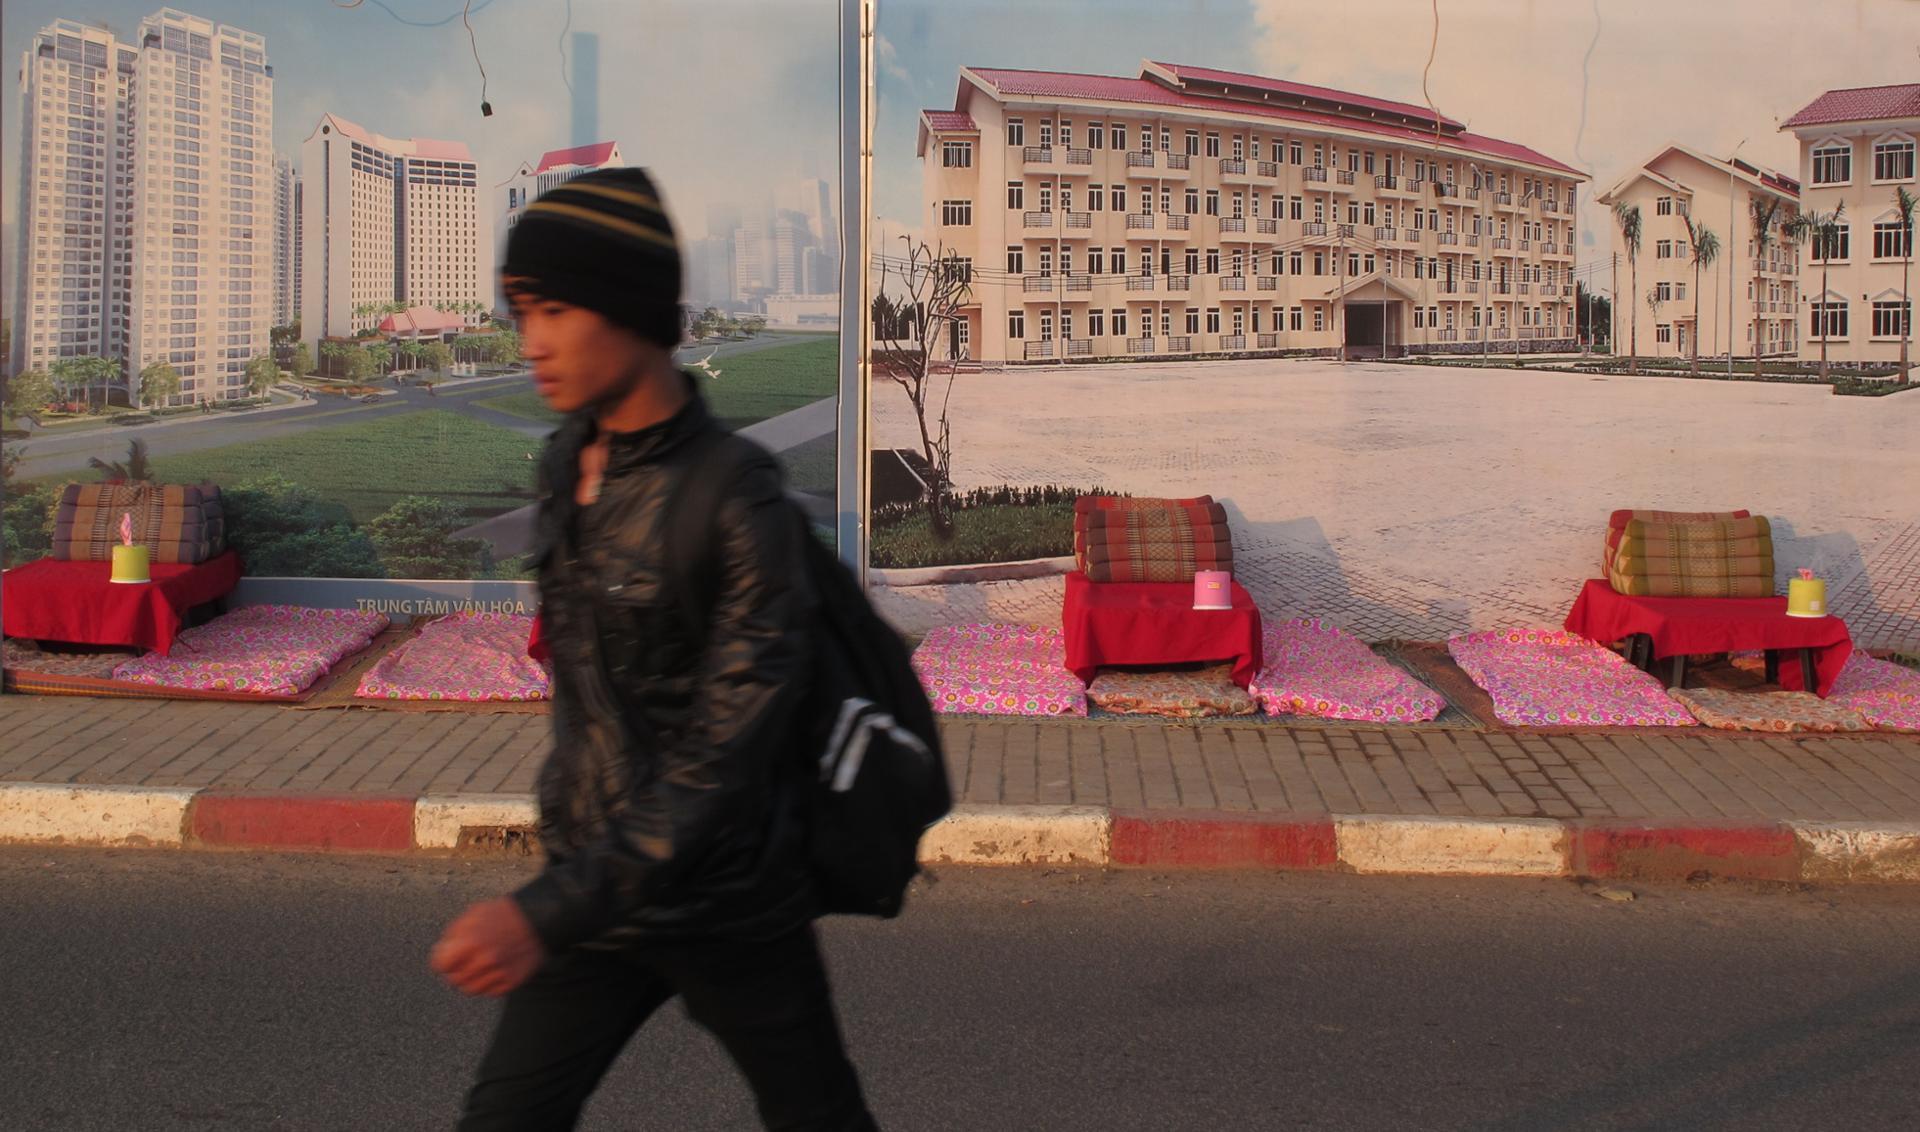 fake city in a real city…!(Murs Murs et des hommes)